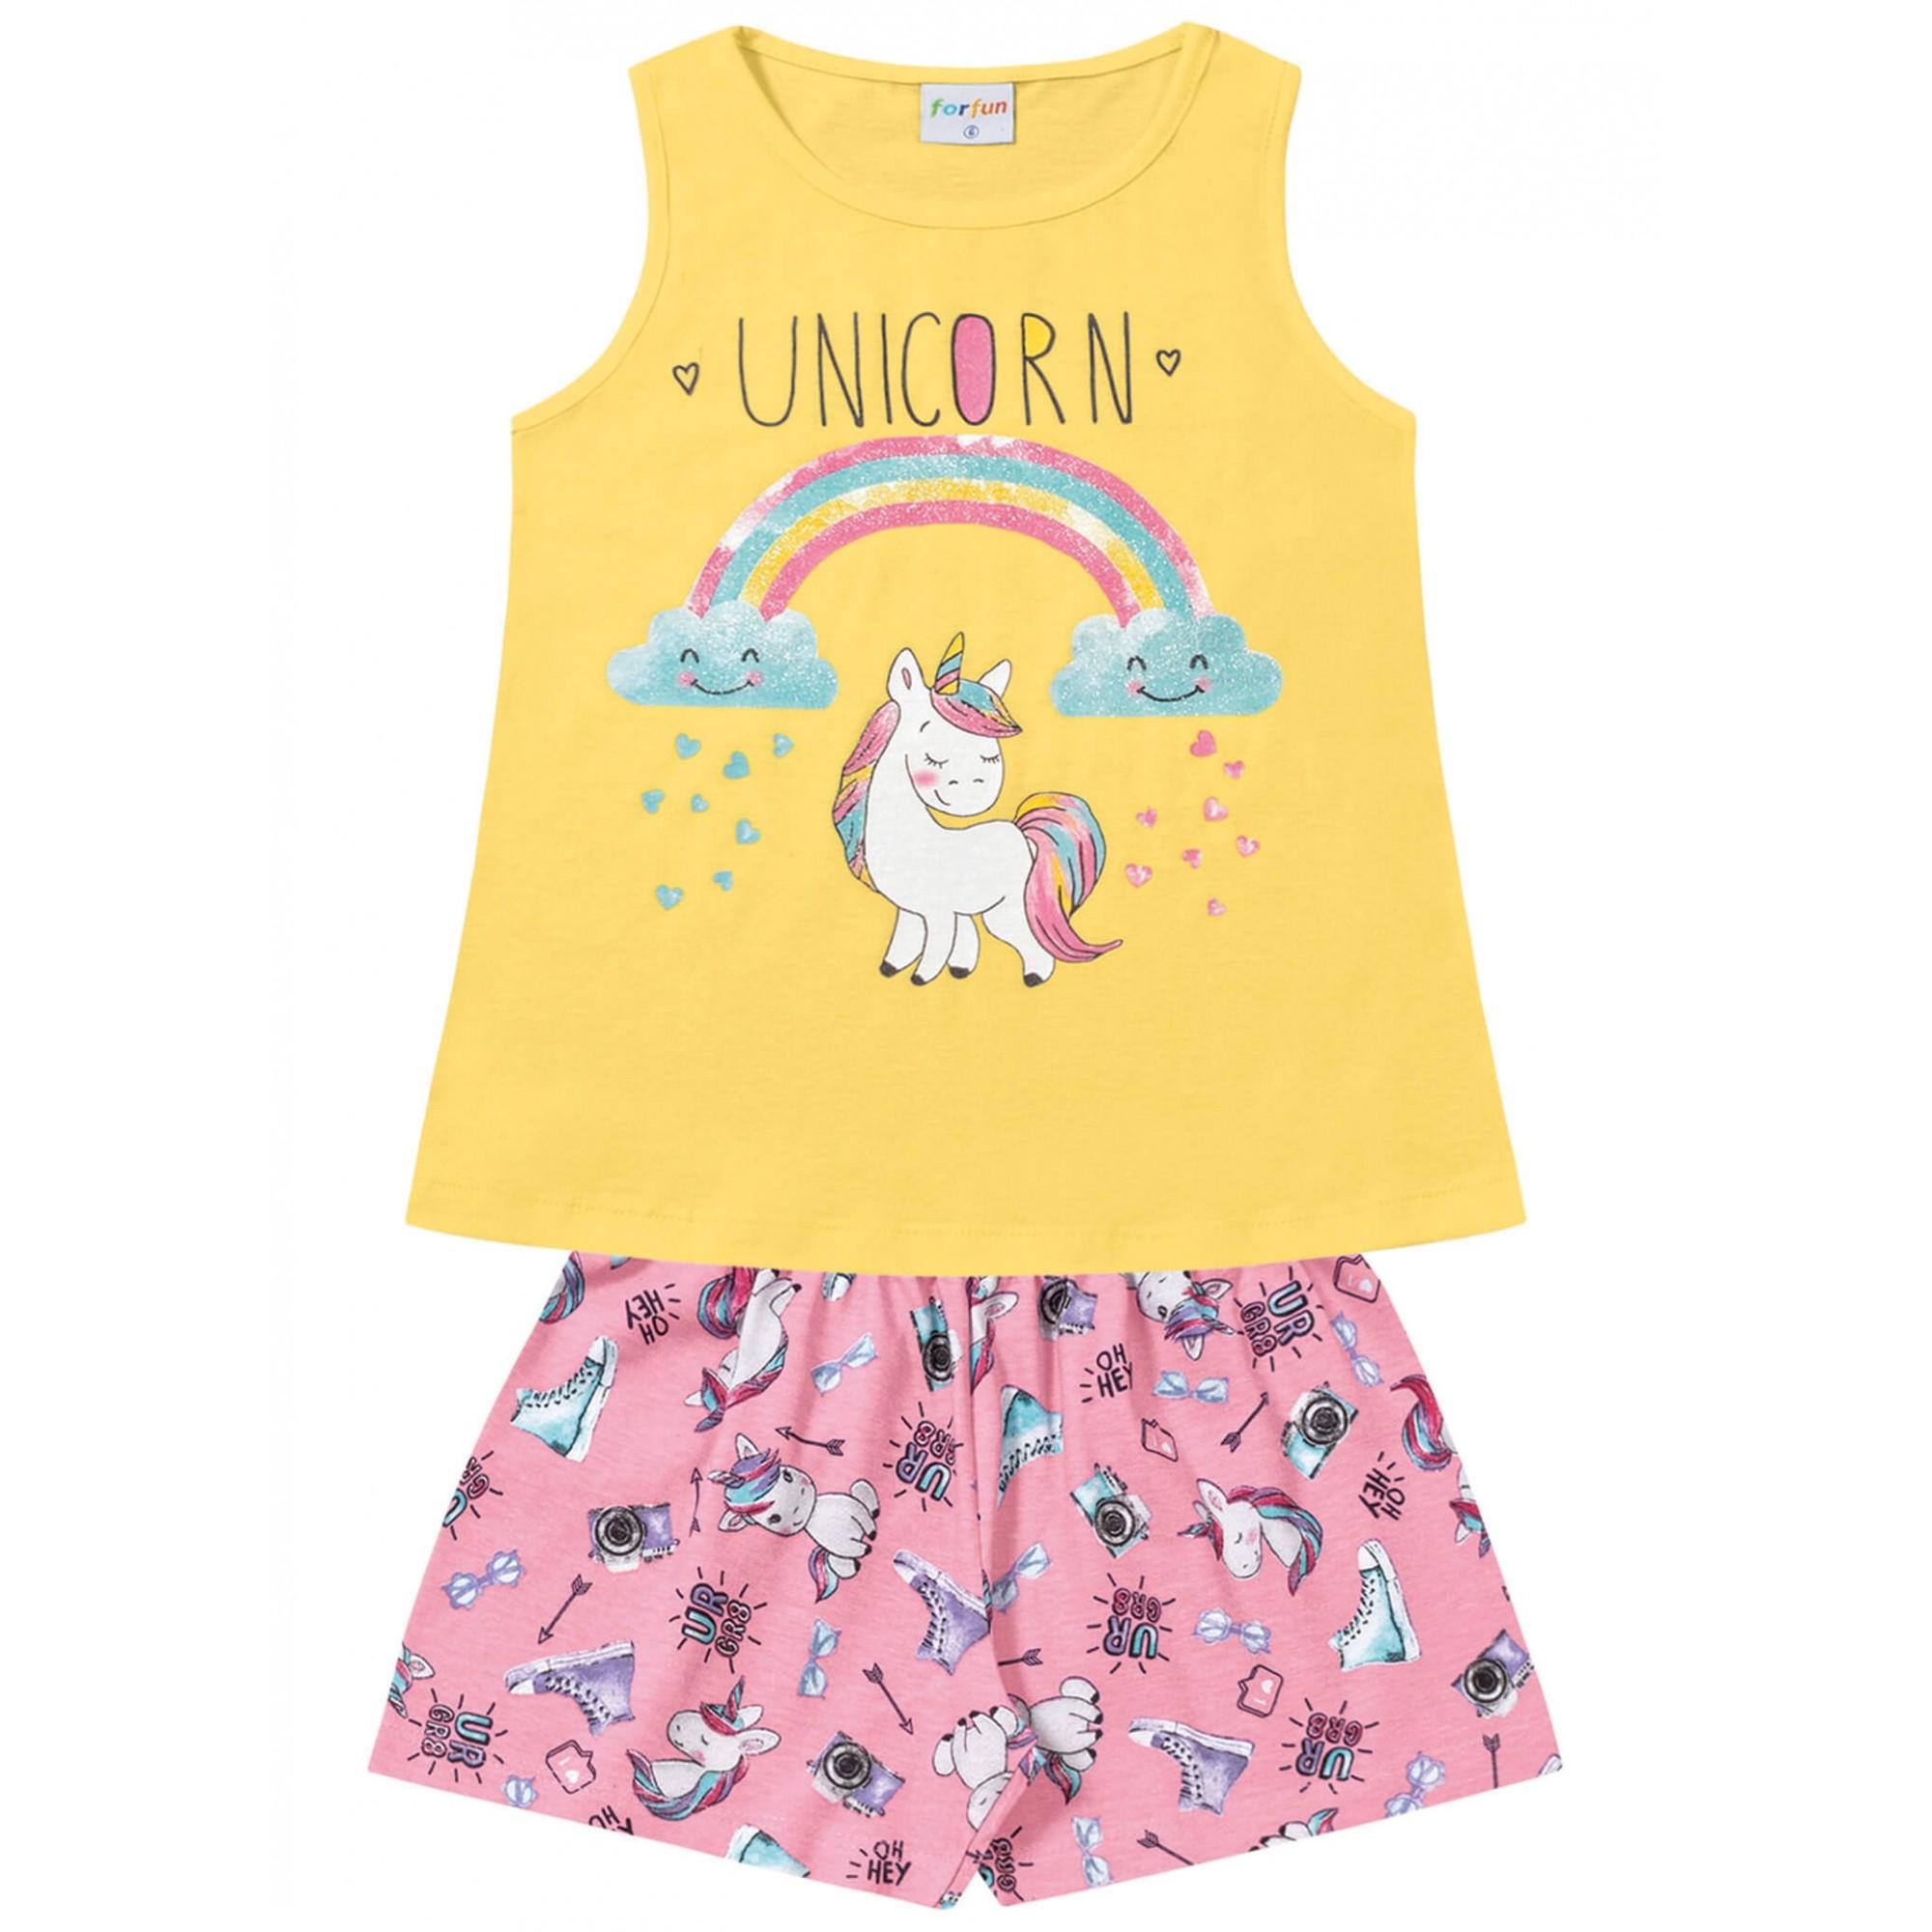 Conjunto Infantil Regata Unicorn Amarelo - For Fun